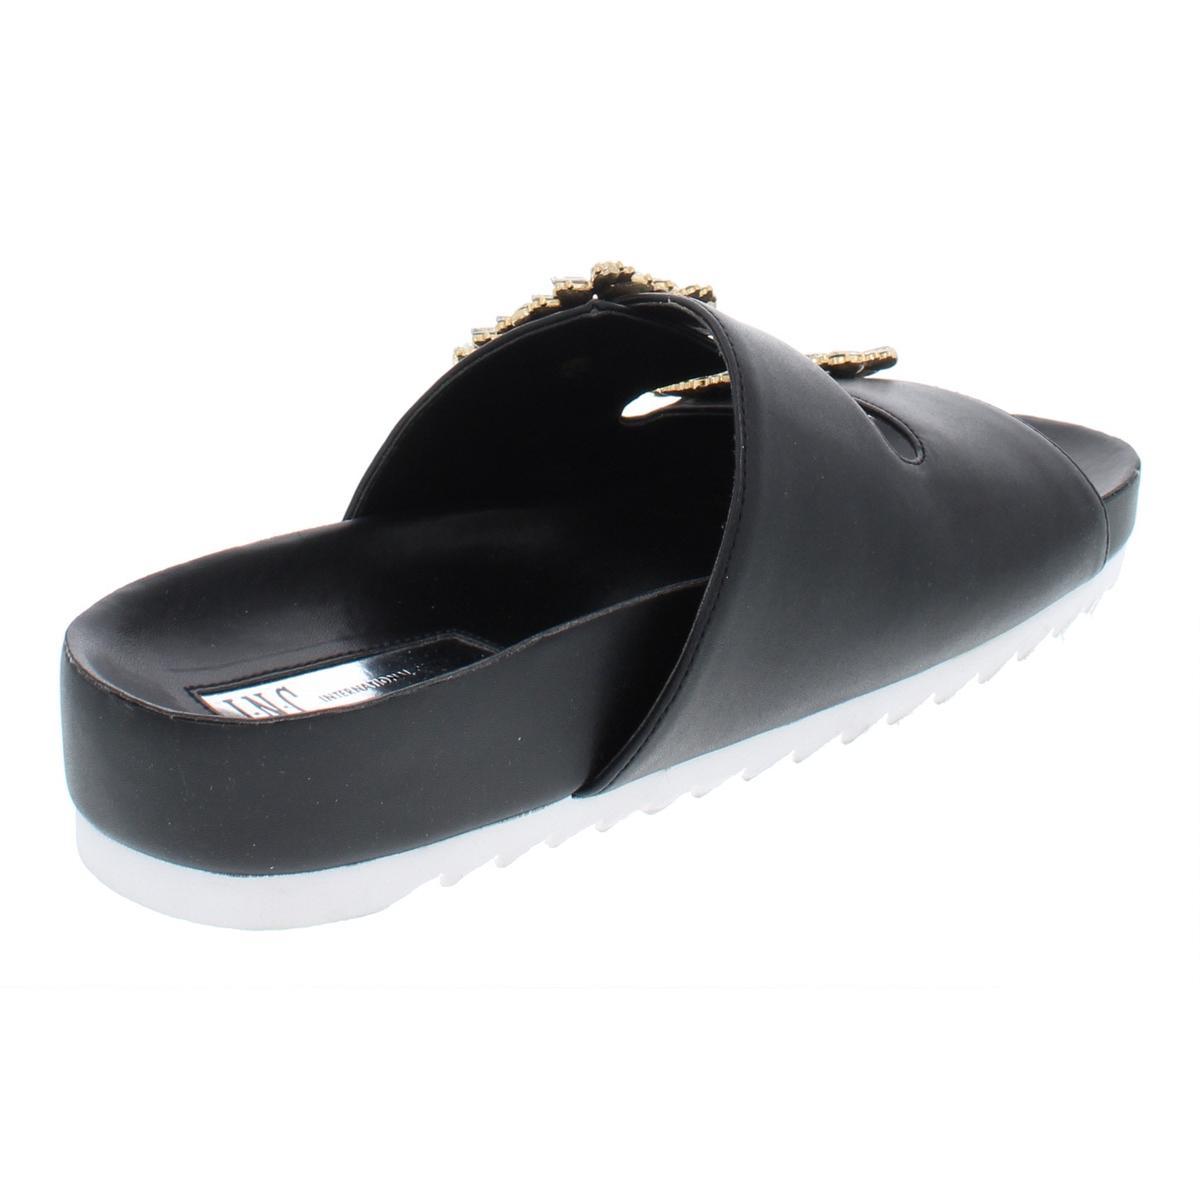 INC-Womens-Alani-Embellished-Metallic-Flat-Sandals-Shoes-BHFO-6405 thumbnail 4